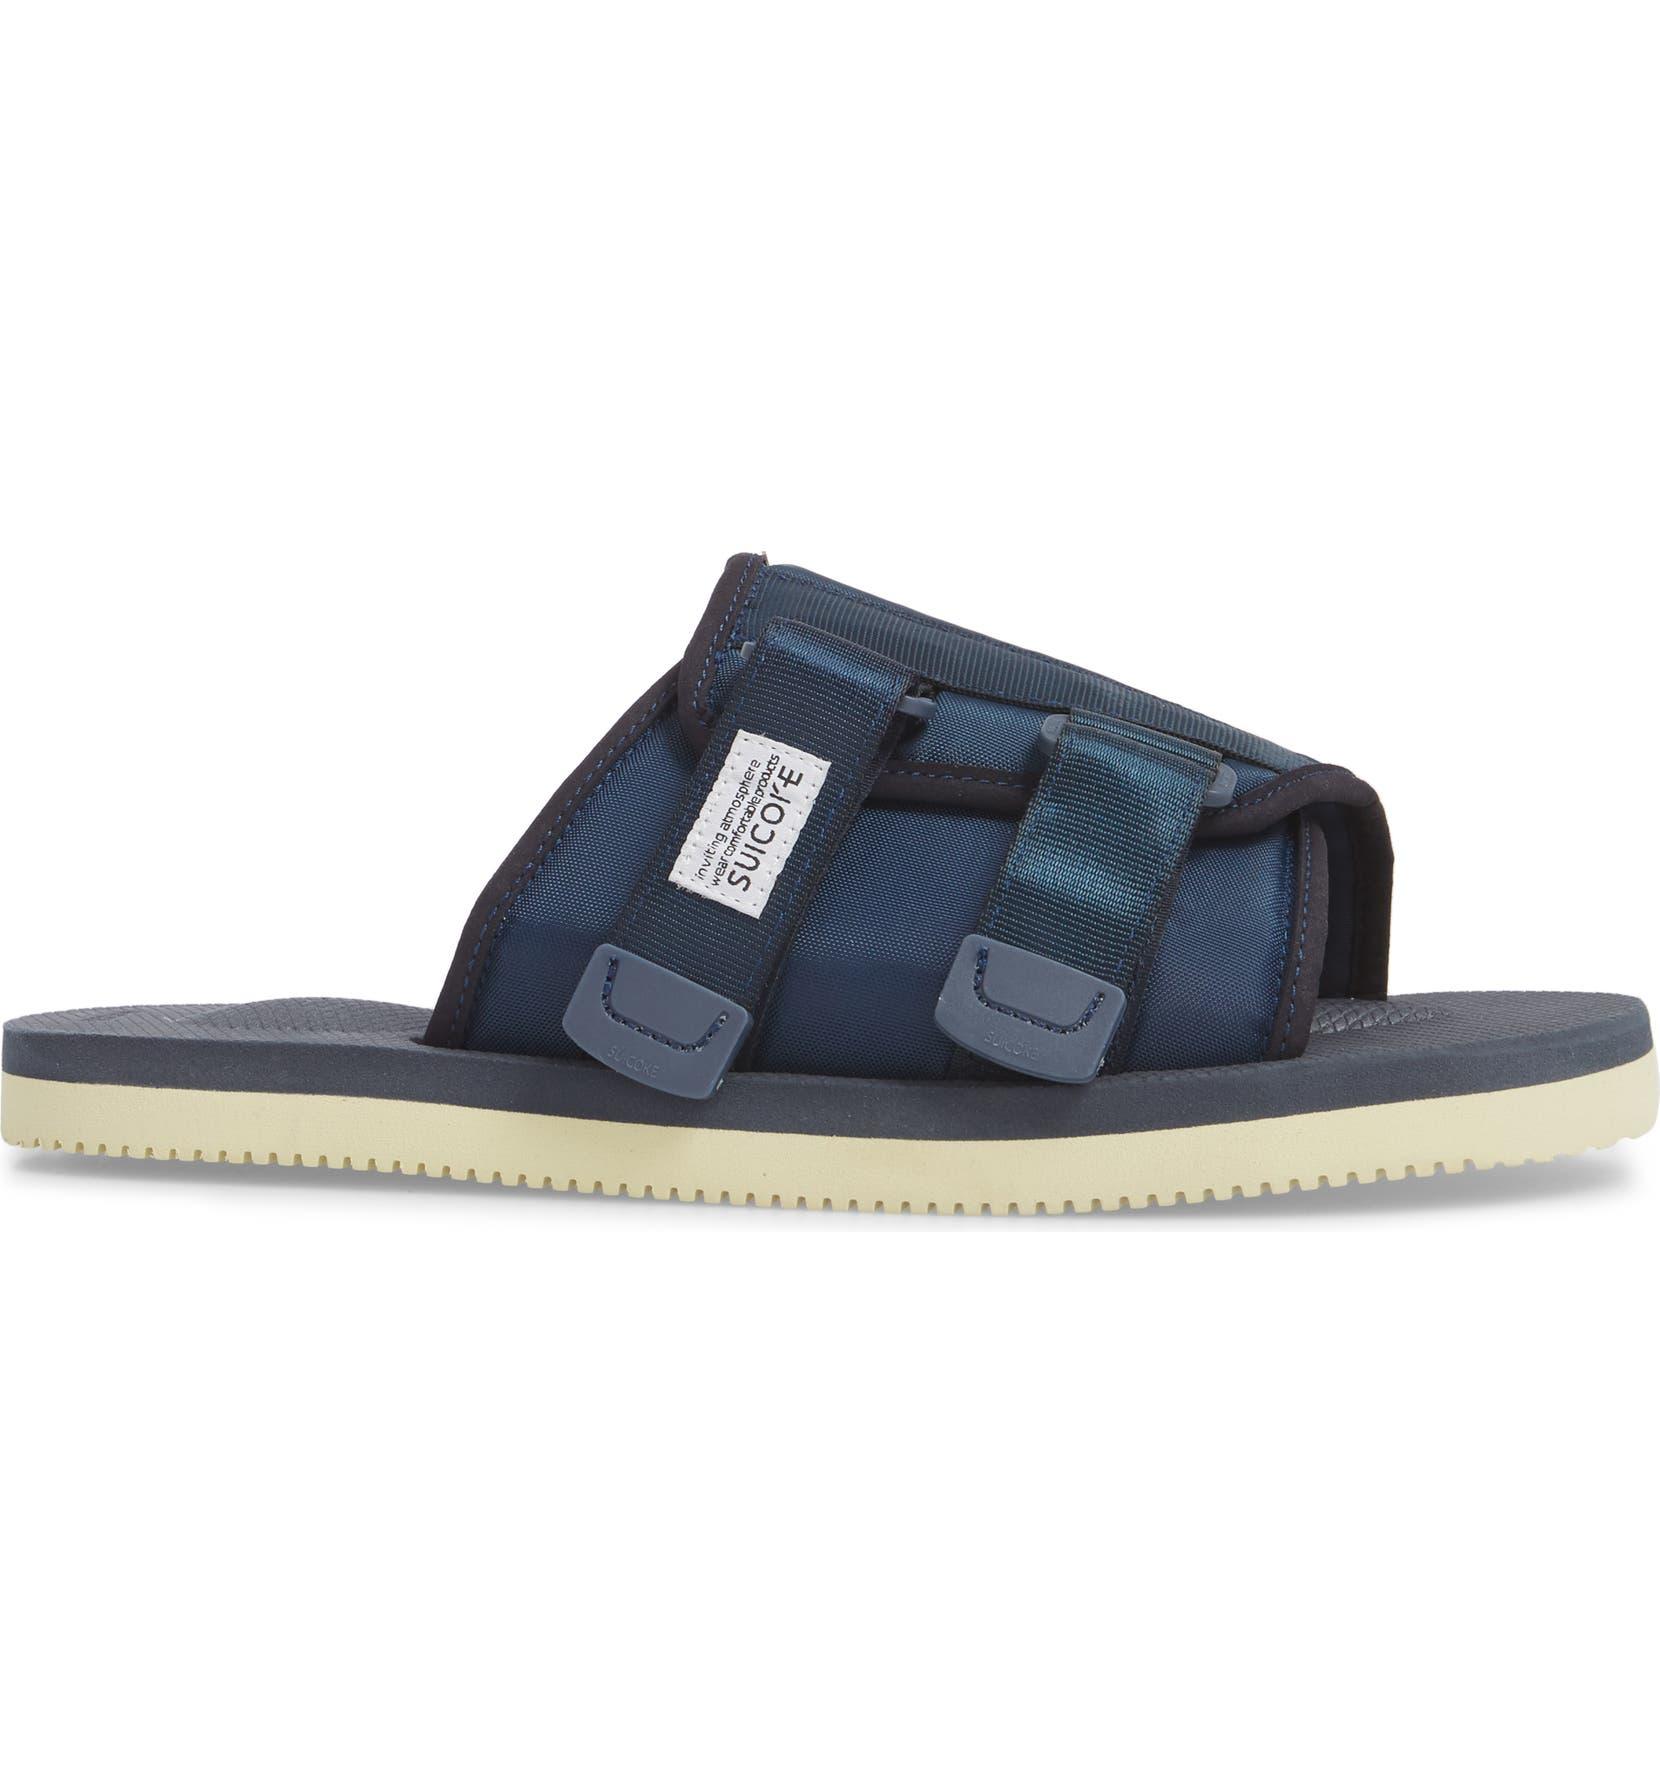 ad0bb0073e4 Suicoke Kaw Cab Slide Sandal (Men)